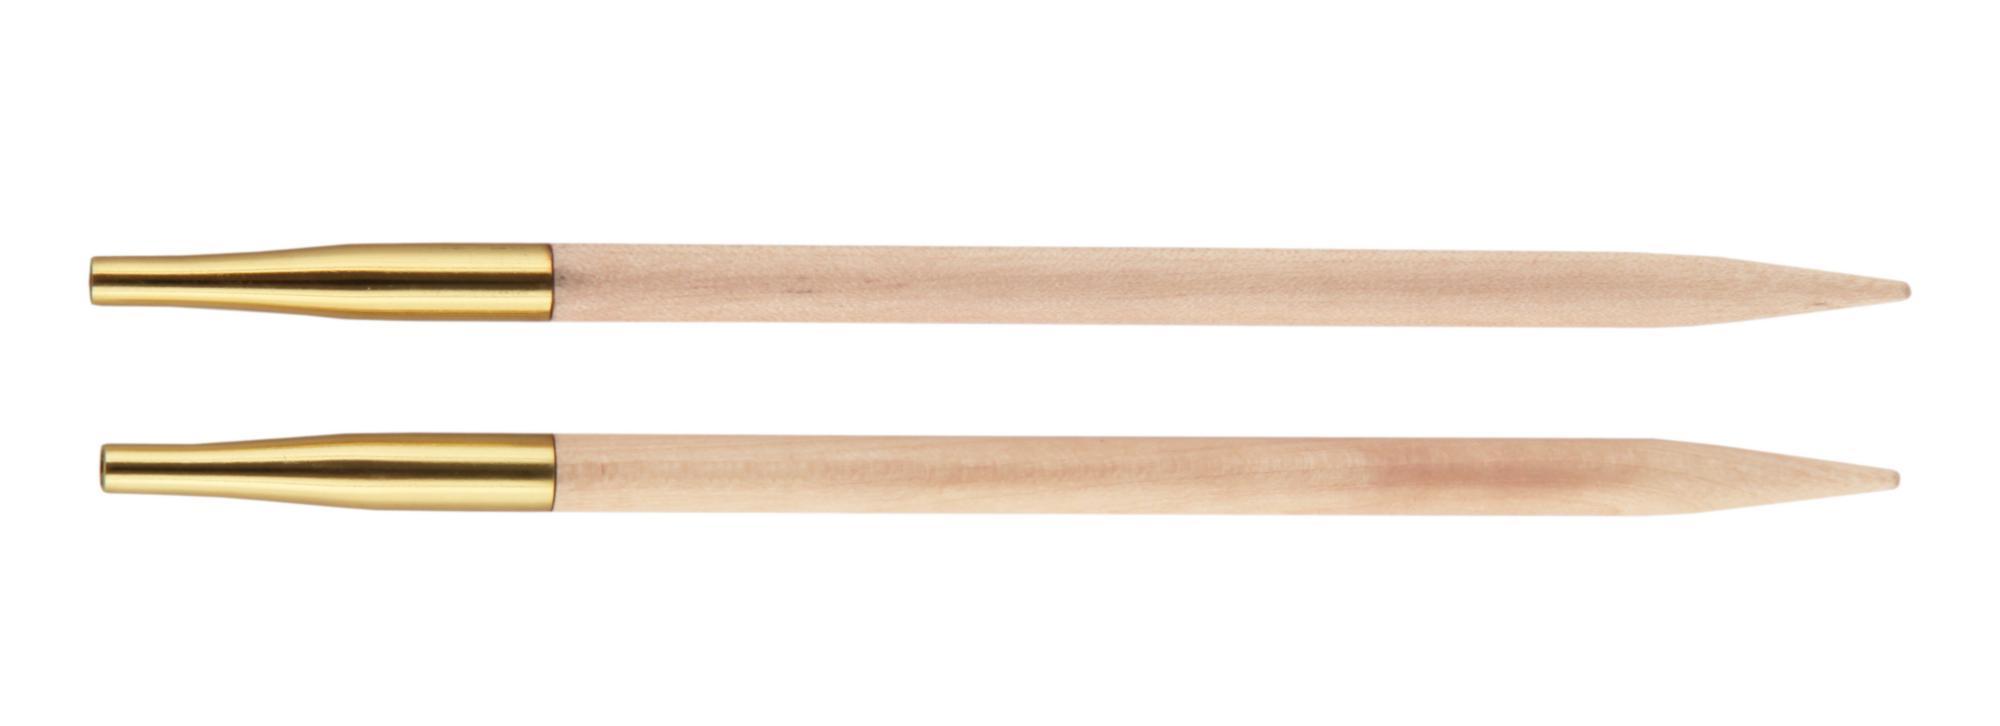 Спицы съемные короткие Basix Birch Wood KnitPro, 35652, 3.25 мм